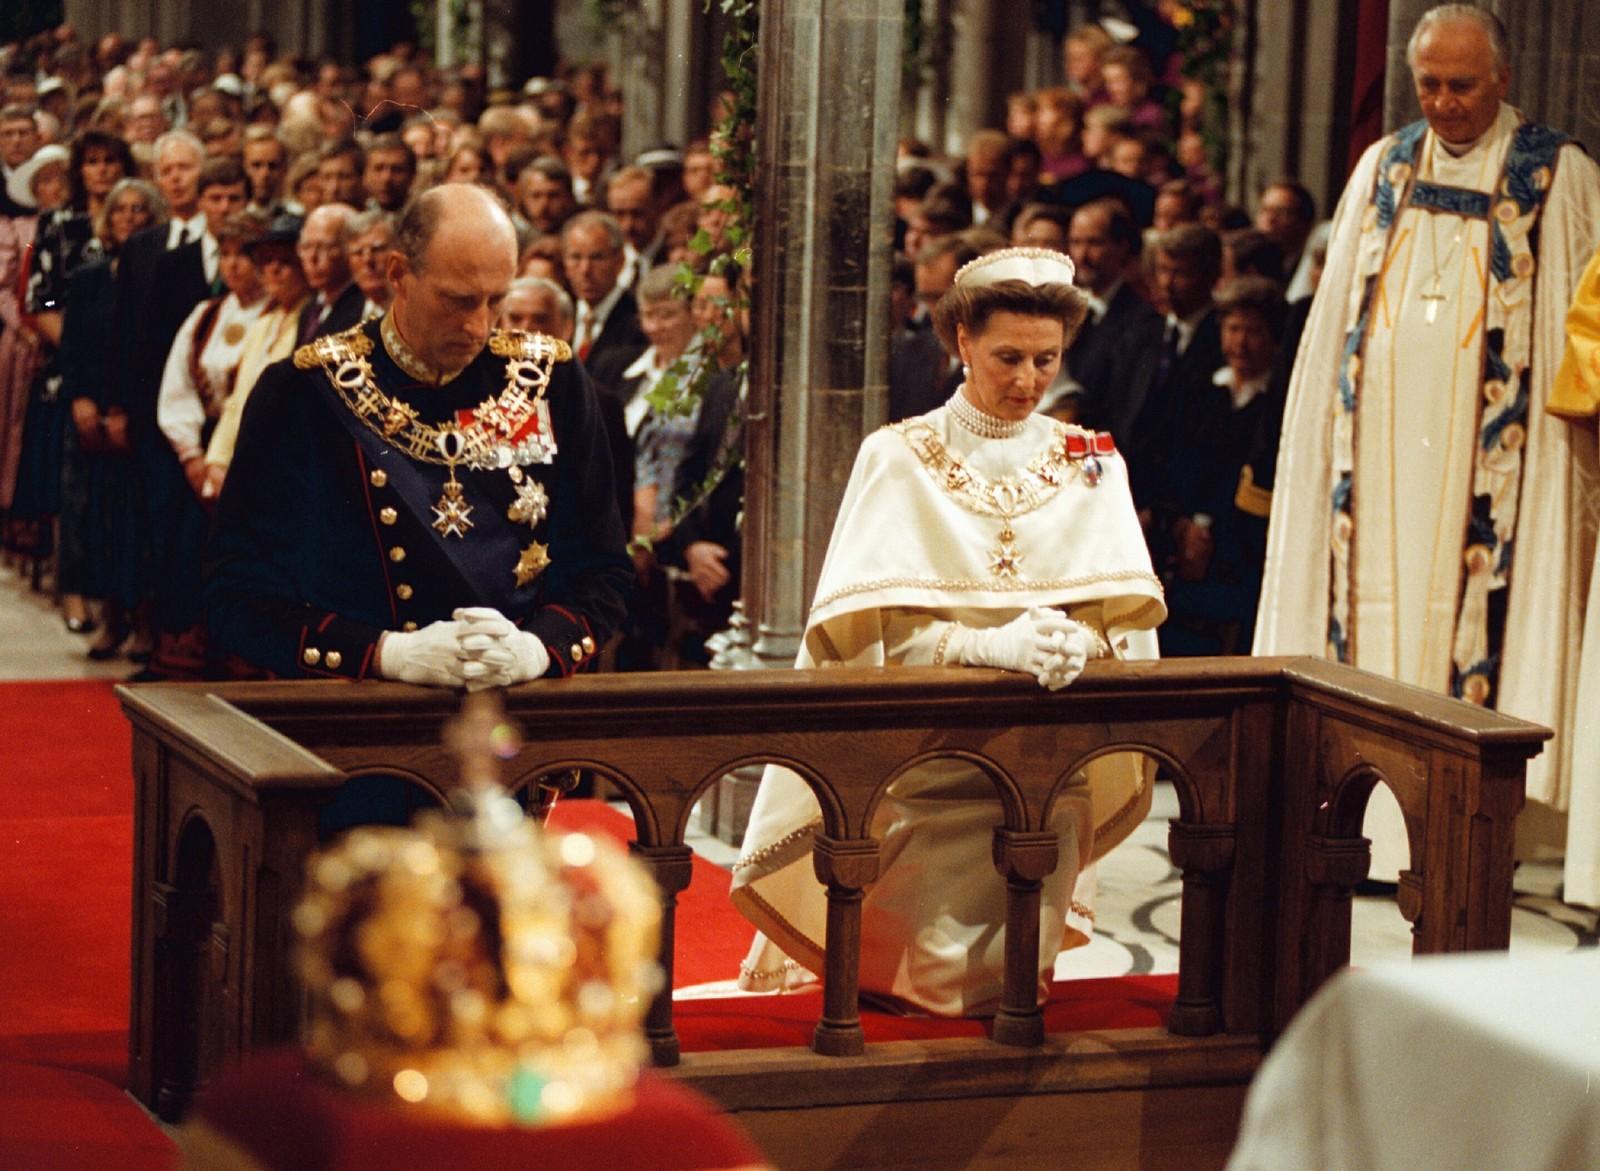 Signingen av kong Harald V i Nidaros Domkirke søndag 23 juni 1991.